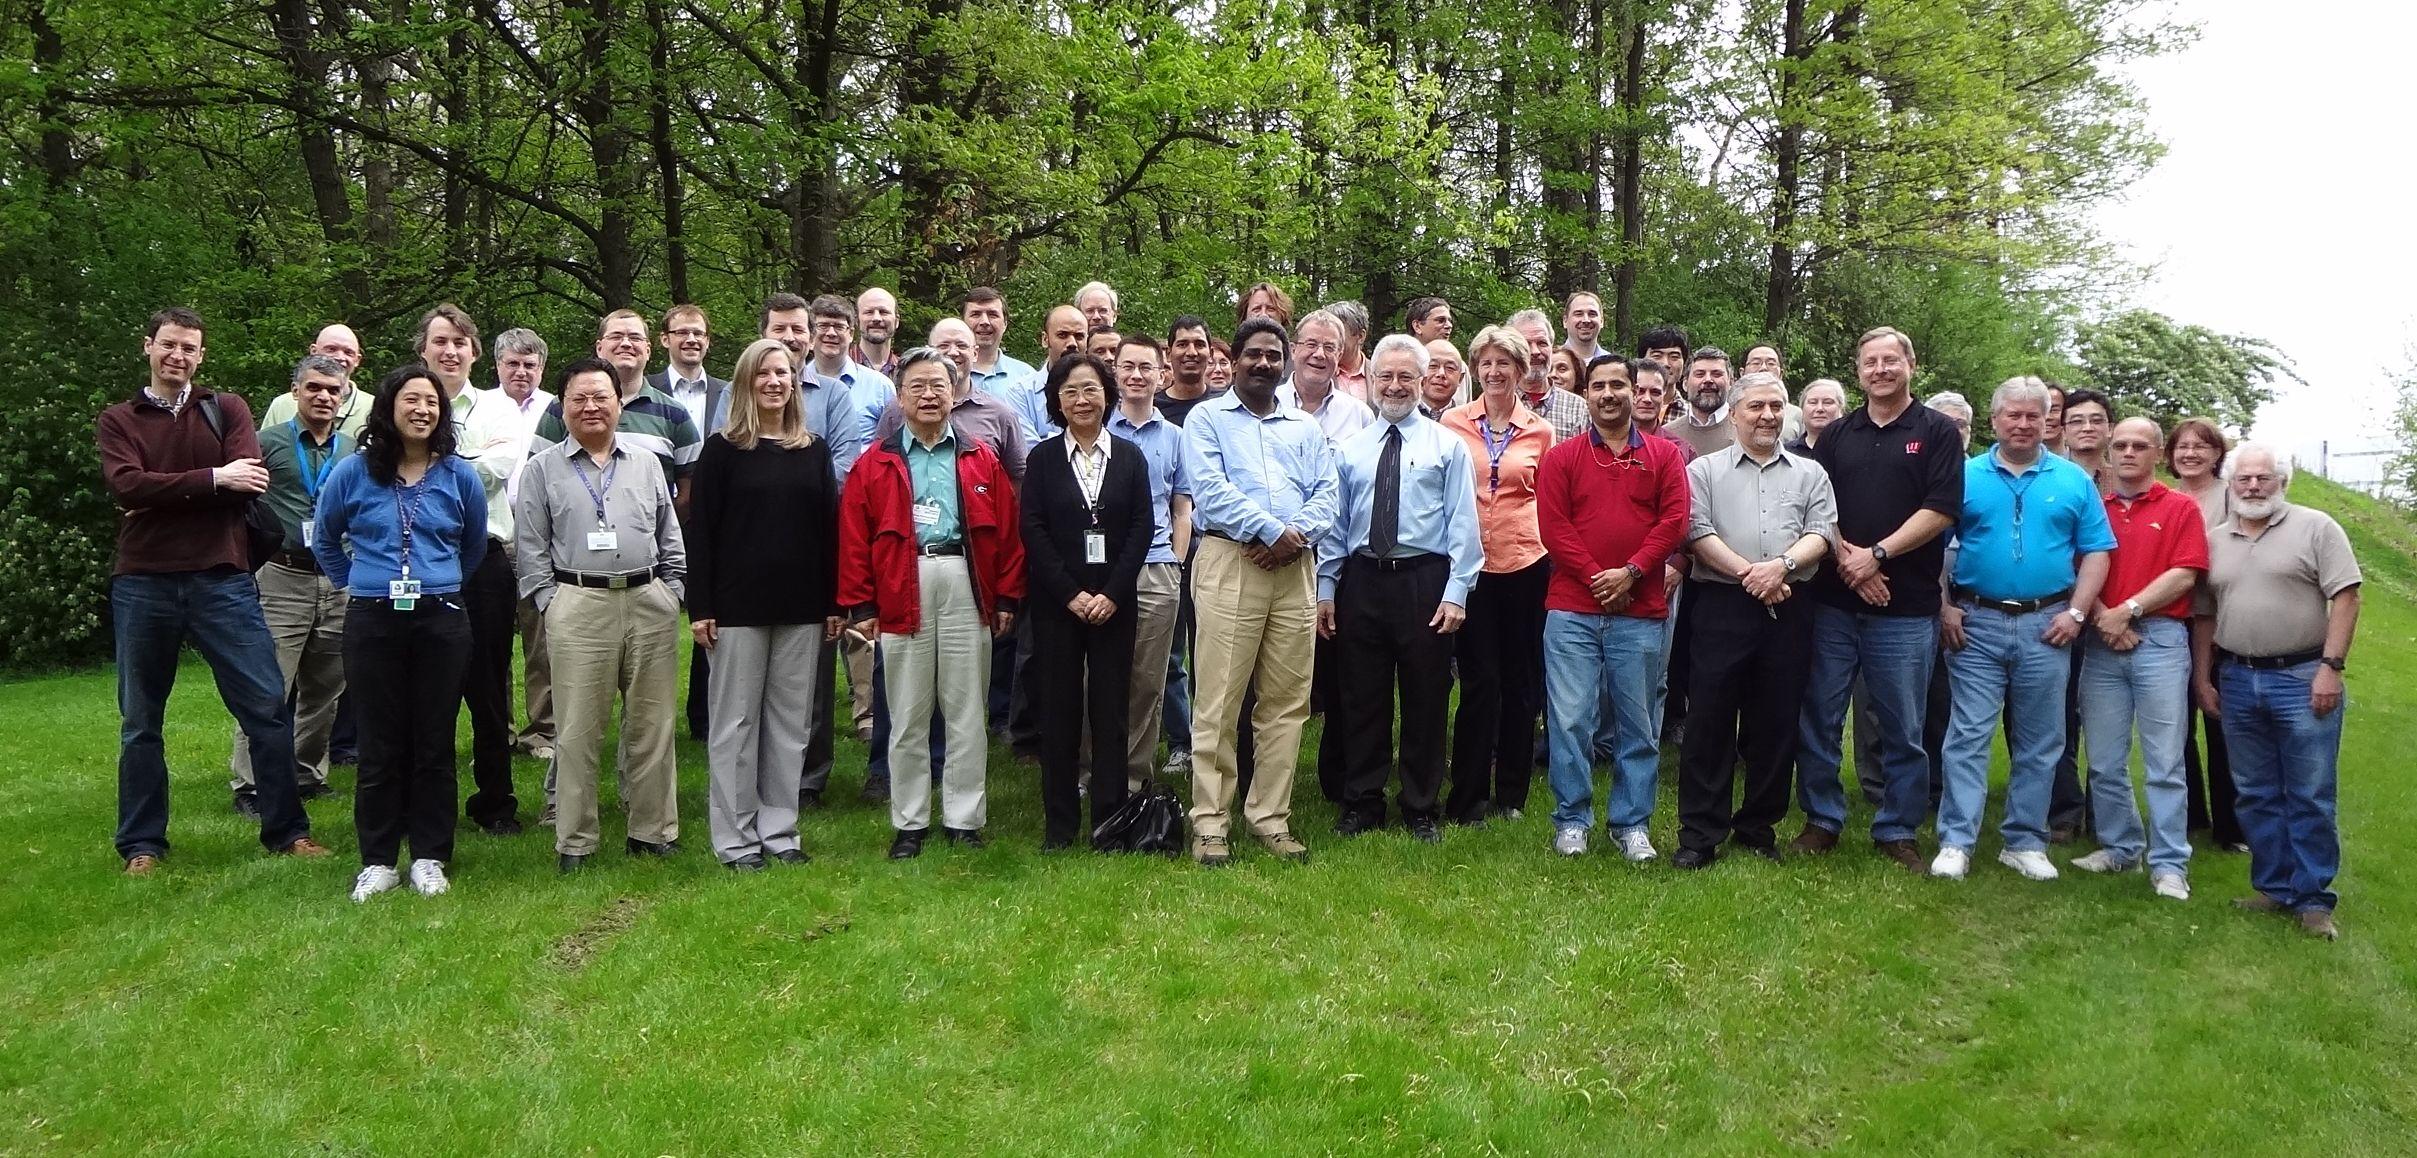 APS Life Sciences Council R&D Workshop, May 2012